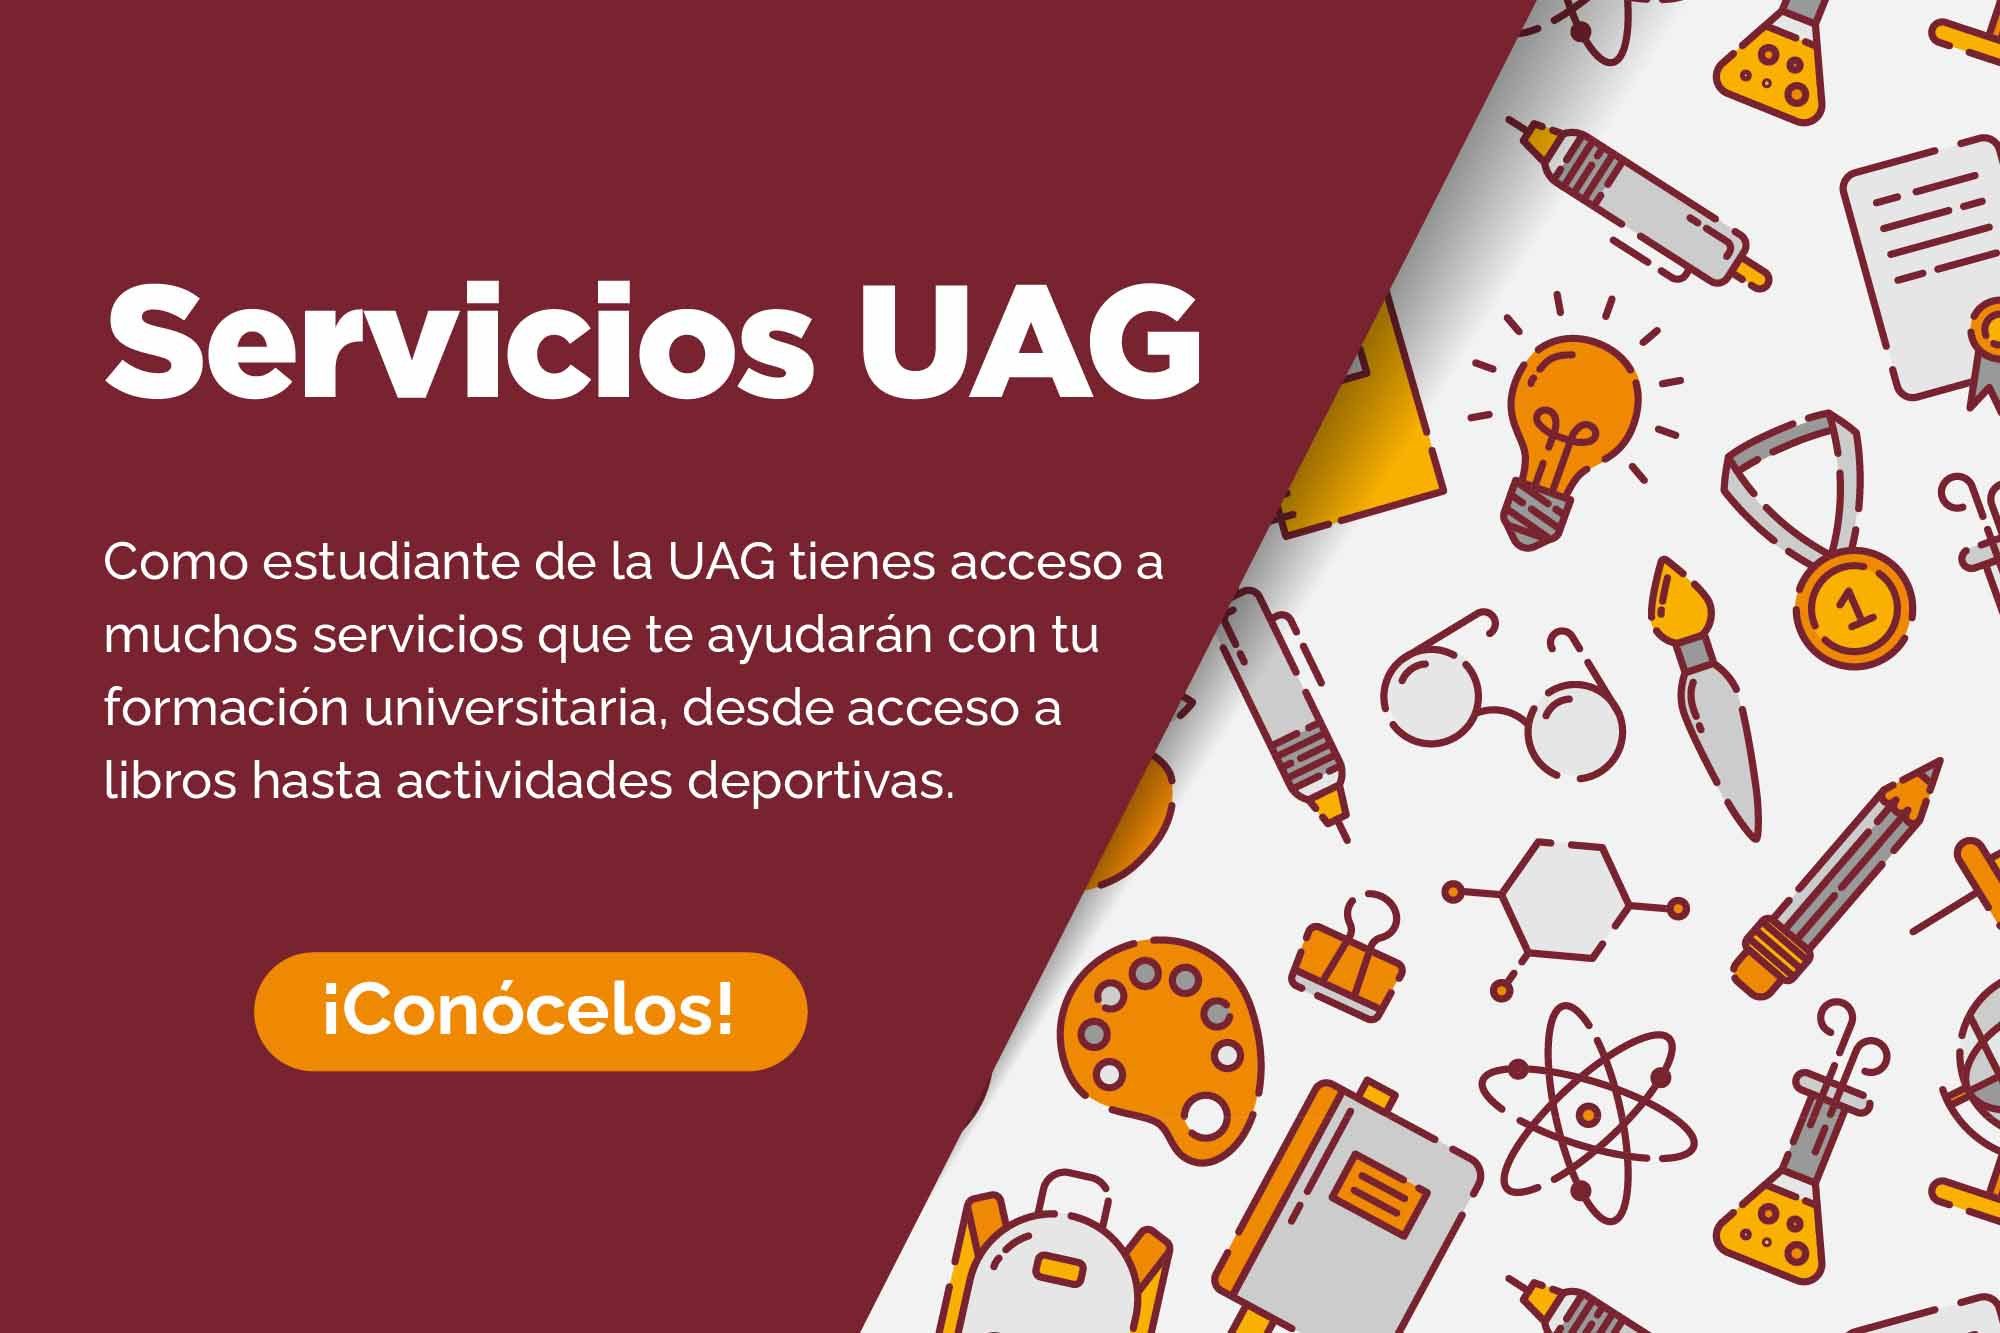 Servicios UAG 130821